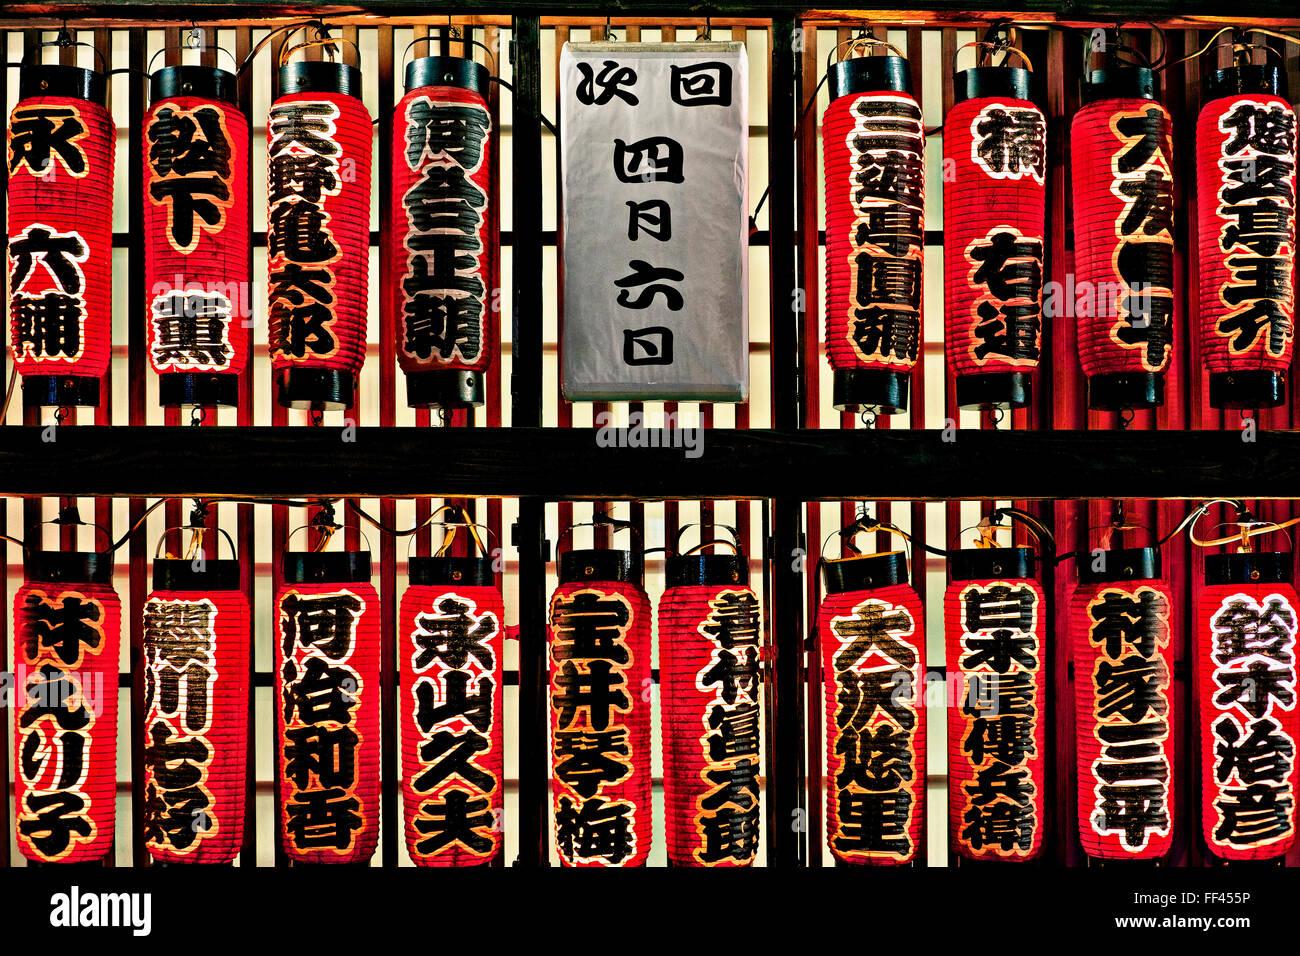 Giappone, isola di Honshu, Kanto, Tokyo, luci. Immagini Stock